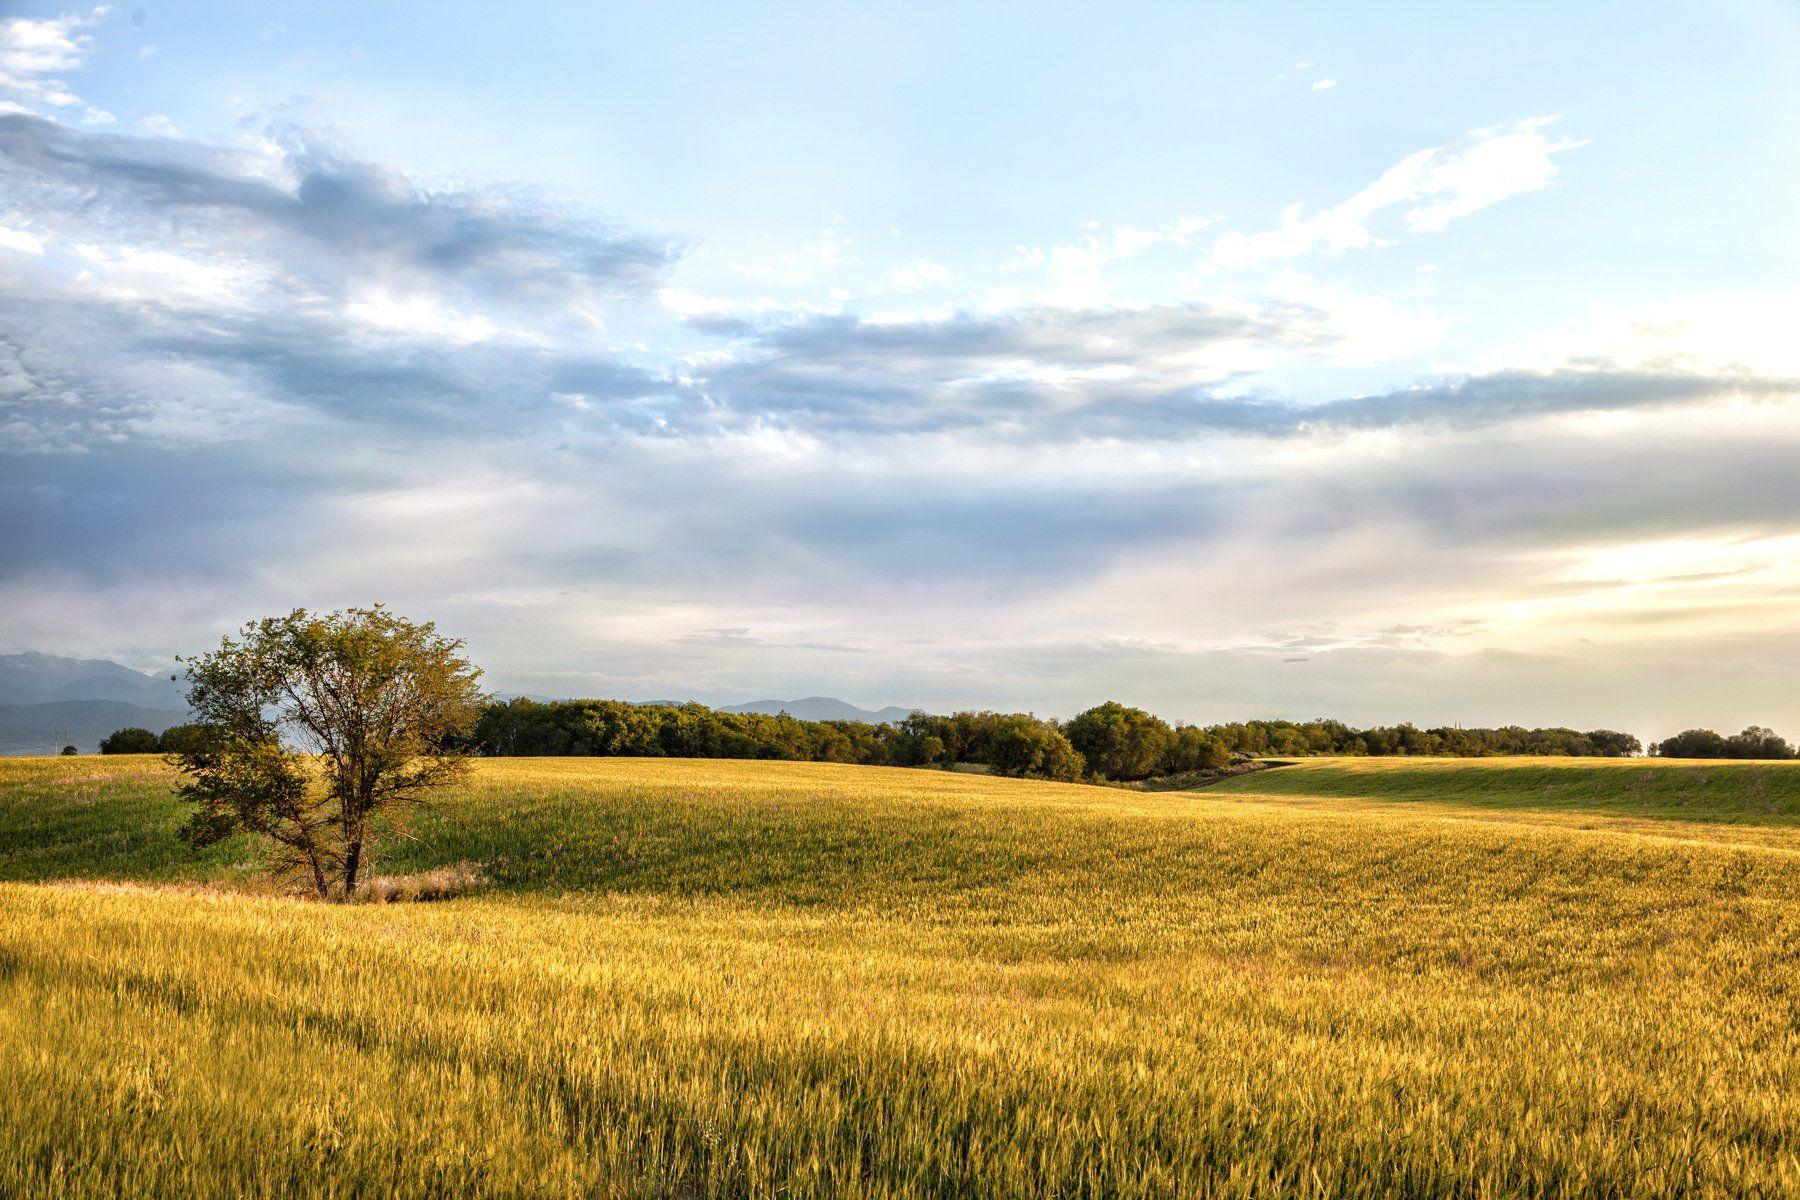 пейзаж, поле, пшеница, закат, облака, дерево, фотограф, алматы, фотограф алматы, landscape, sunset, the sun, wheat, tree, photographer, аlmaty, amazing, awesome, Вера Иванова